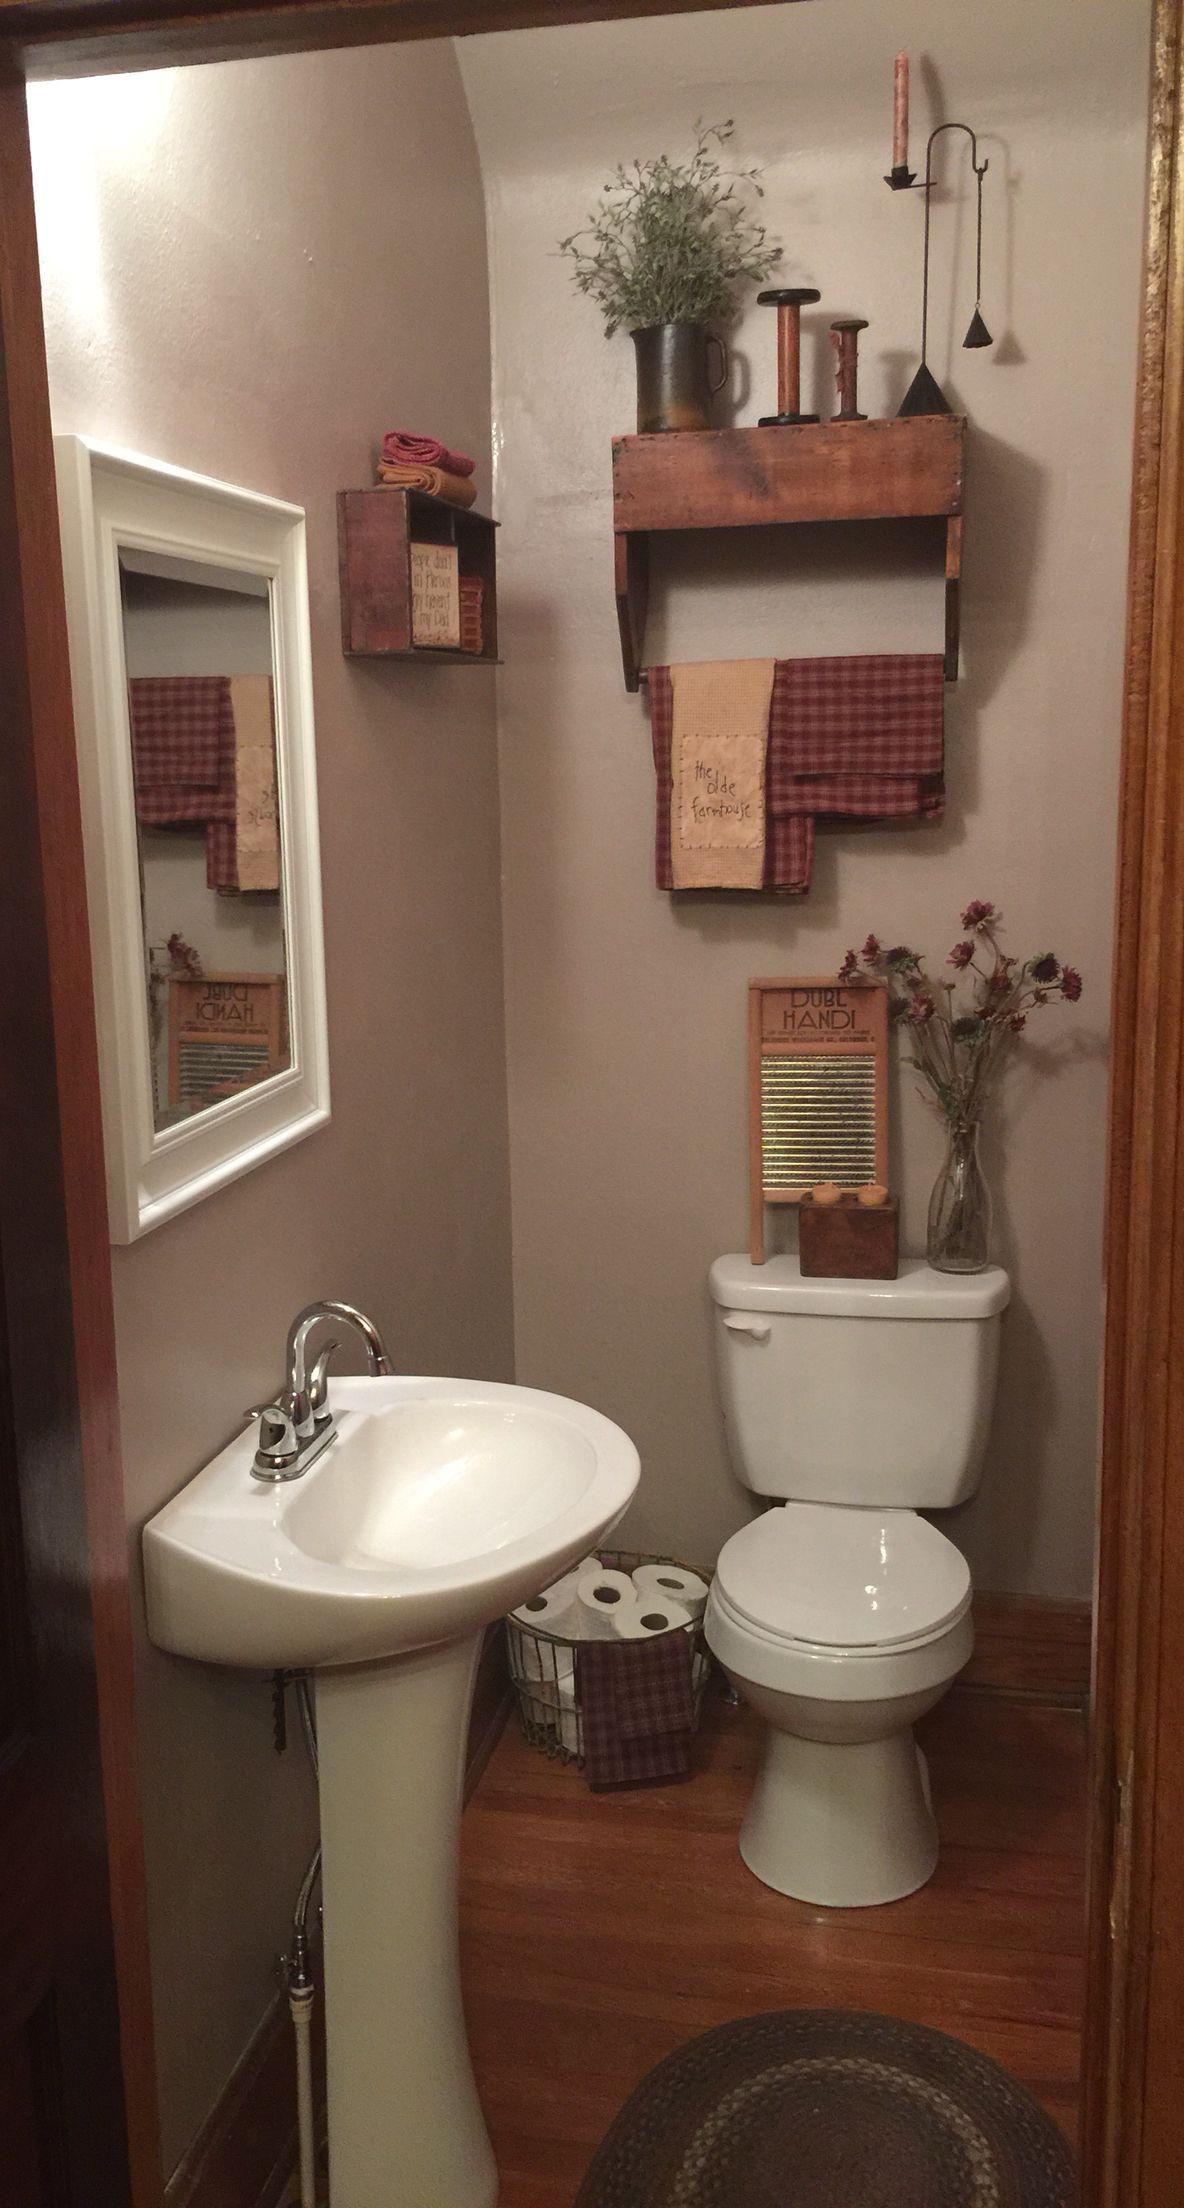 Hall Closet Turned Into Primitive Half Bath Upstairs Bathrooms Small Half Bathrooms Basement Bathroom Design